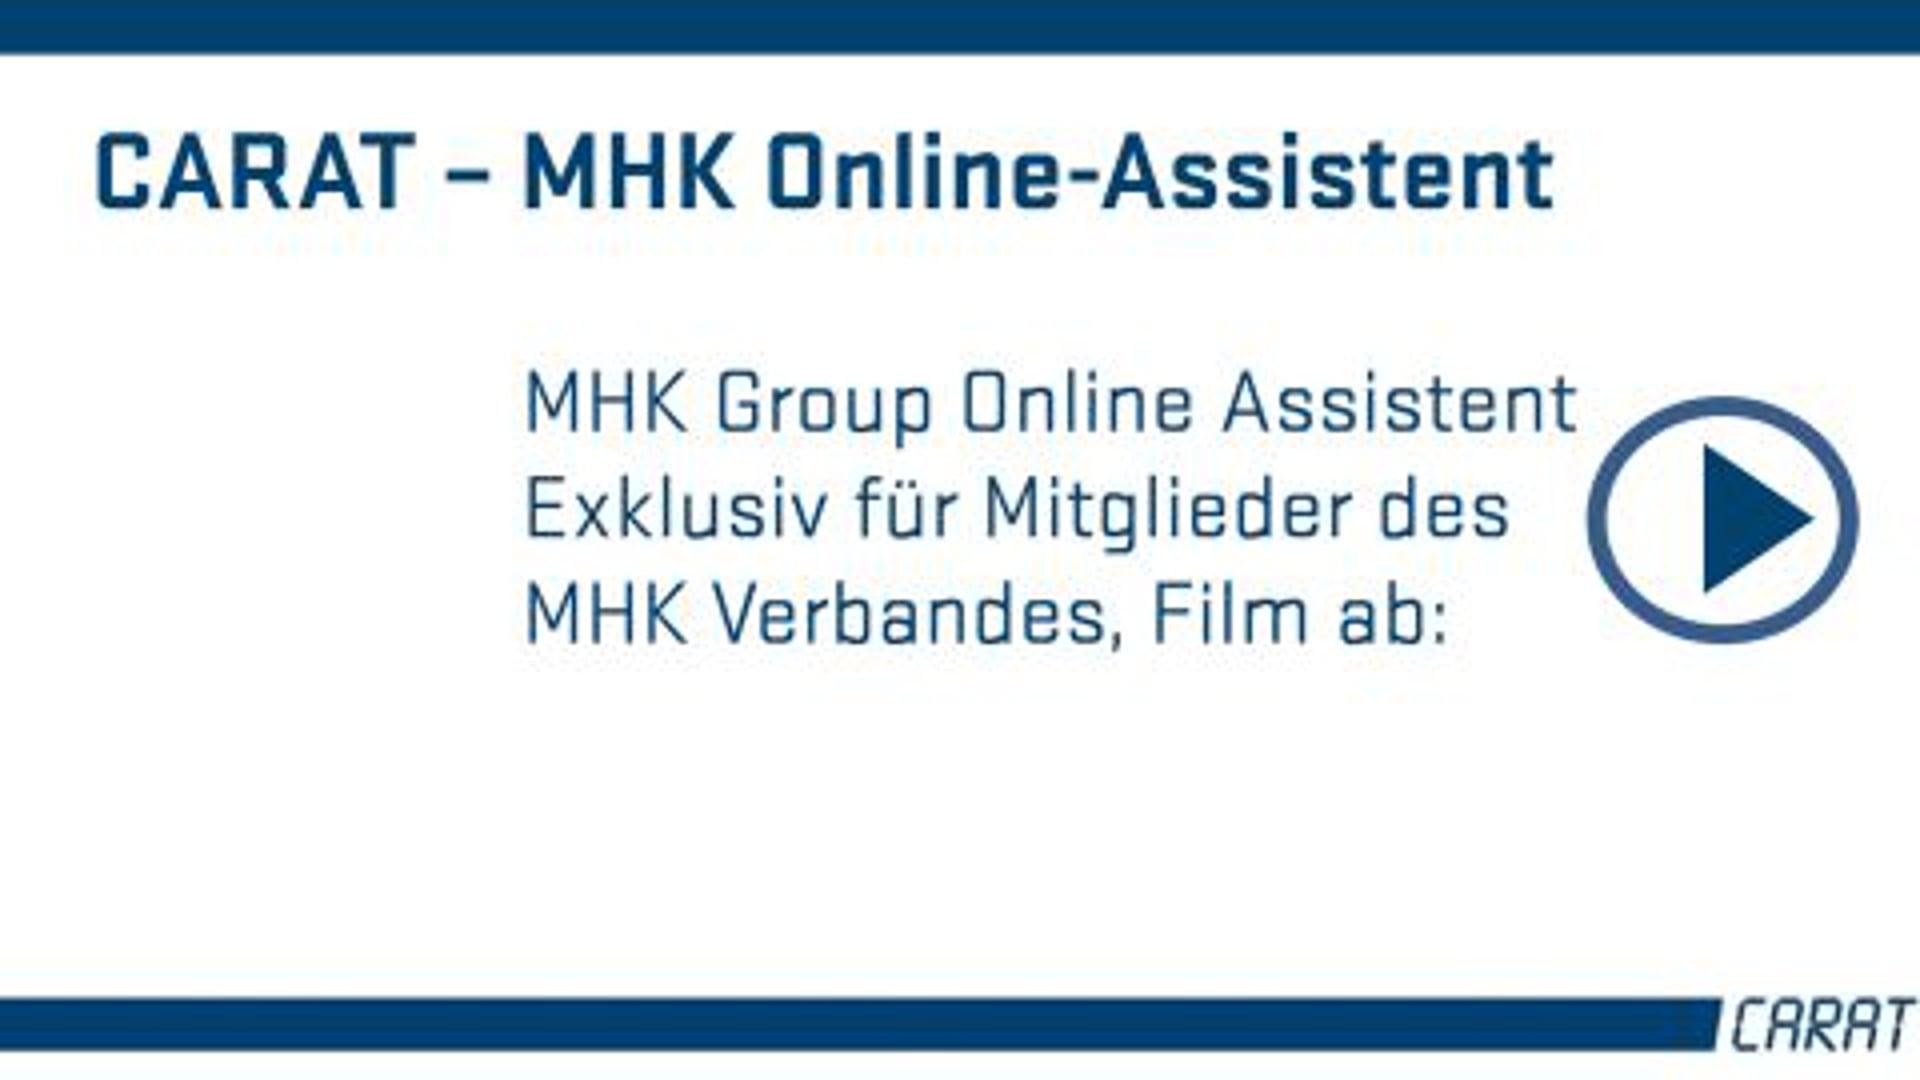 MHK Group Online Assistent